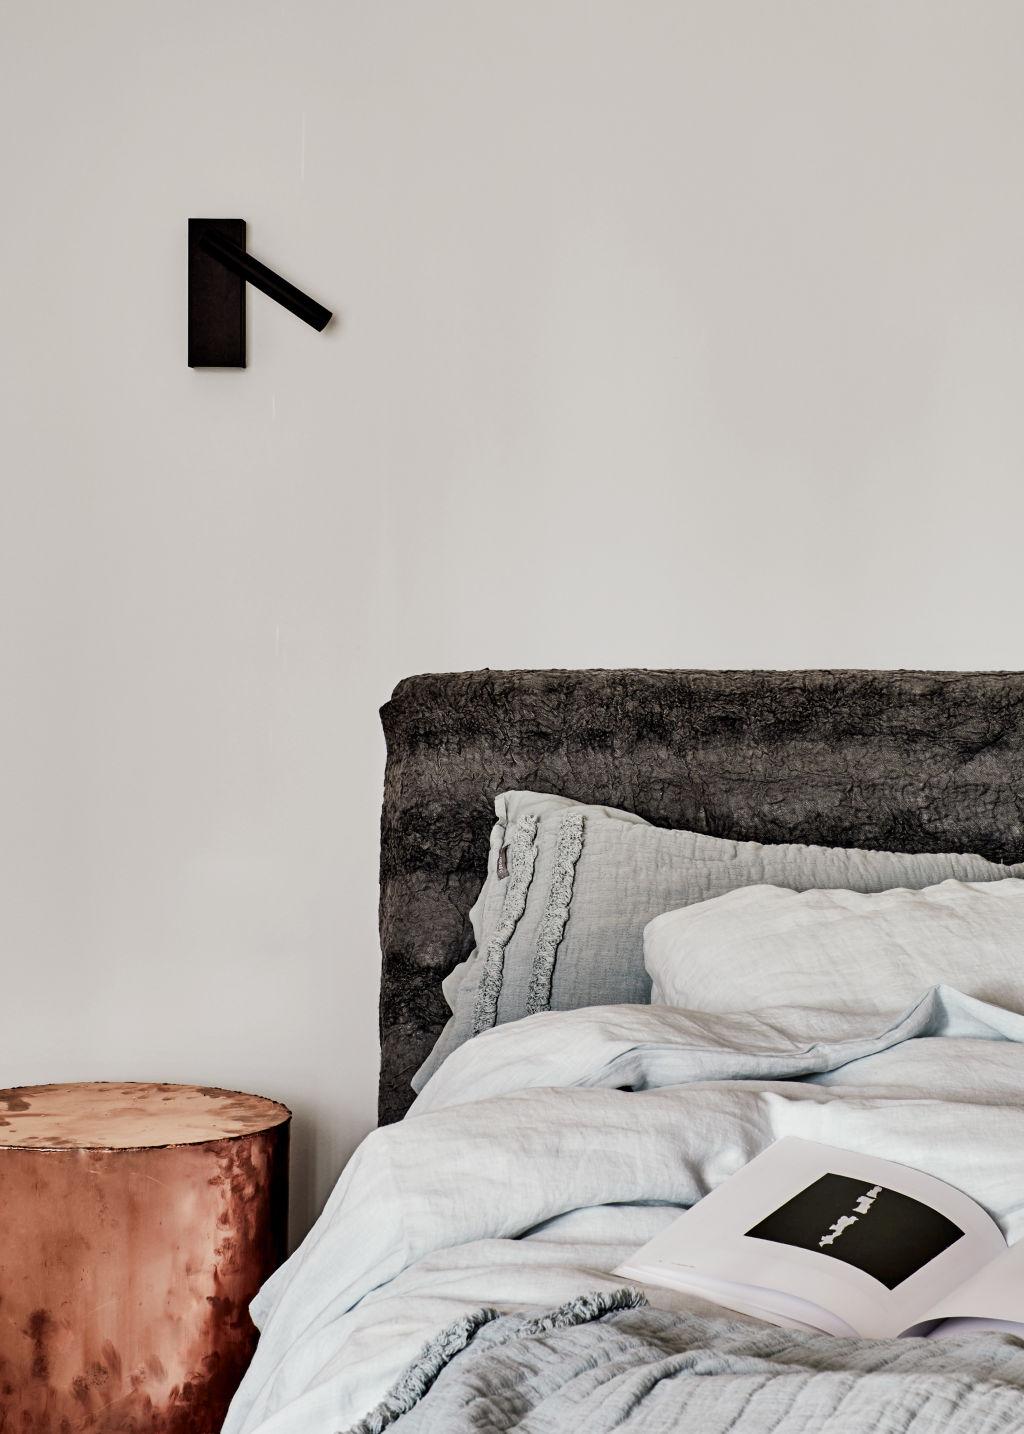 Malvern_East_House_by_Fiona_Lynch_Office_35_photographer_Amelia_Stanwix_zuvikg